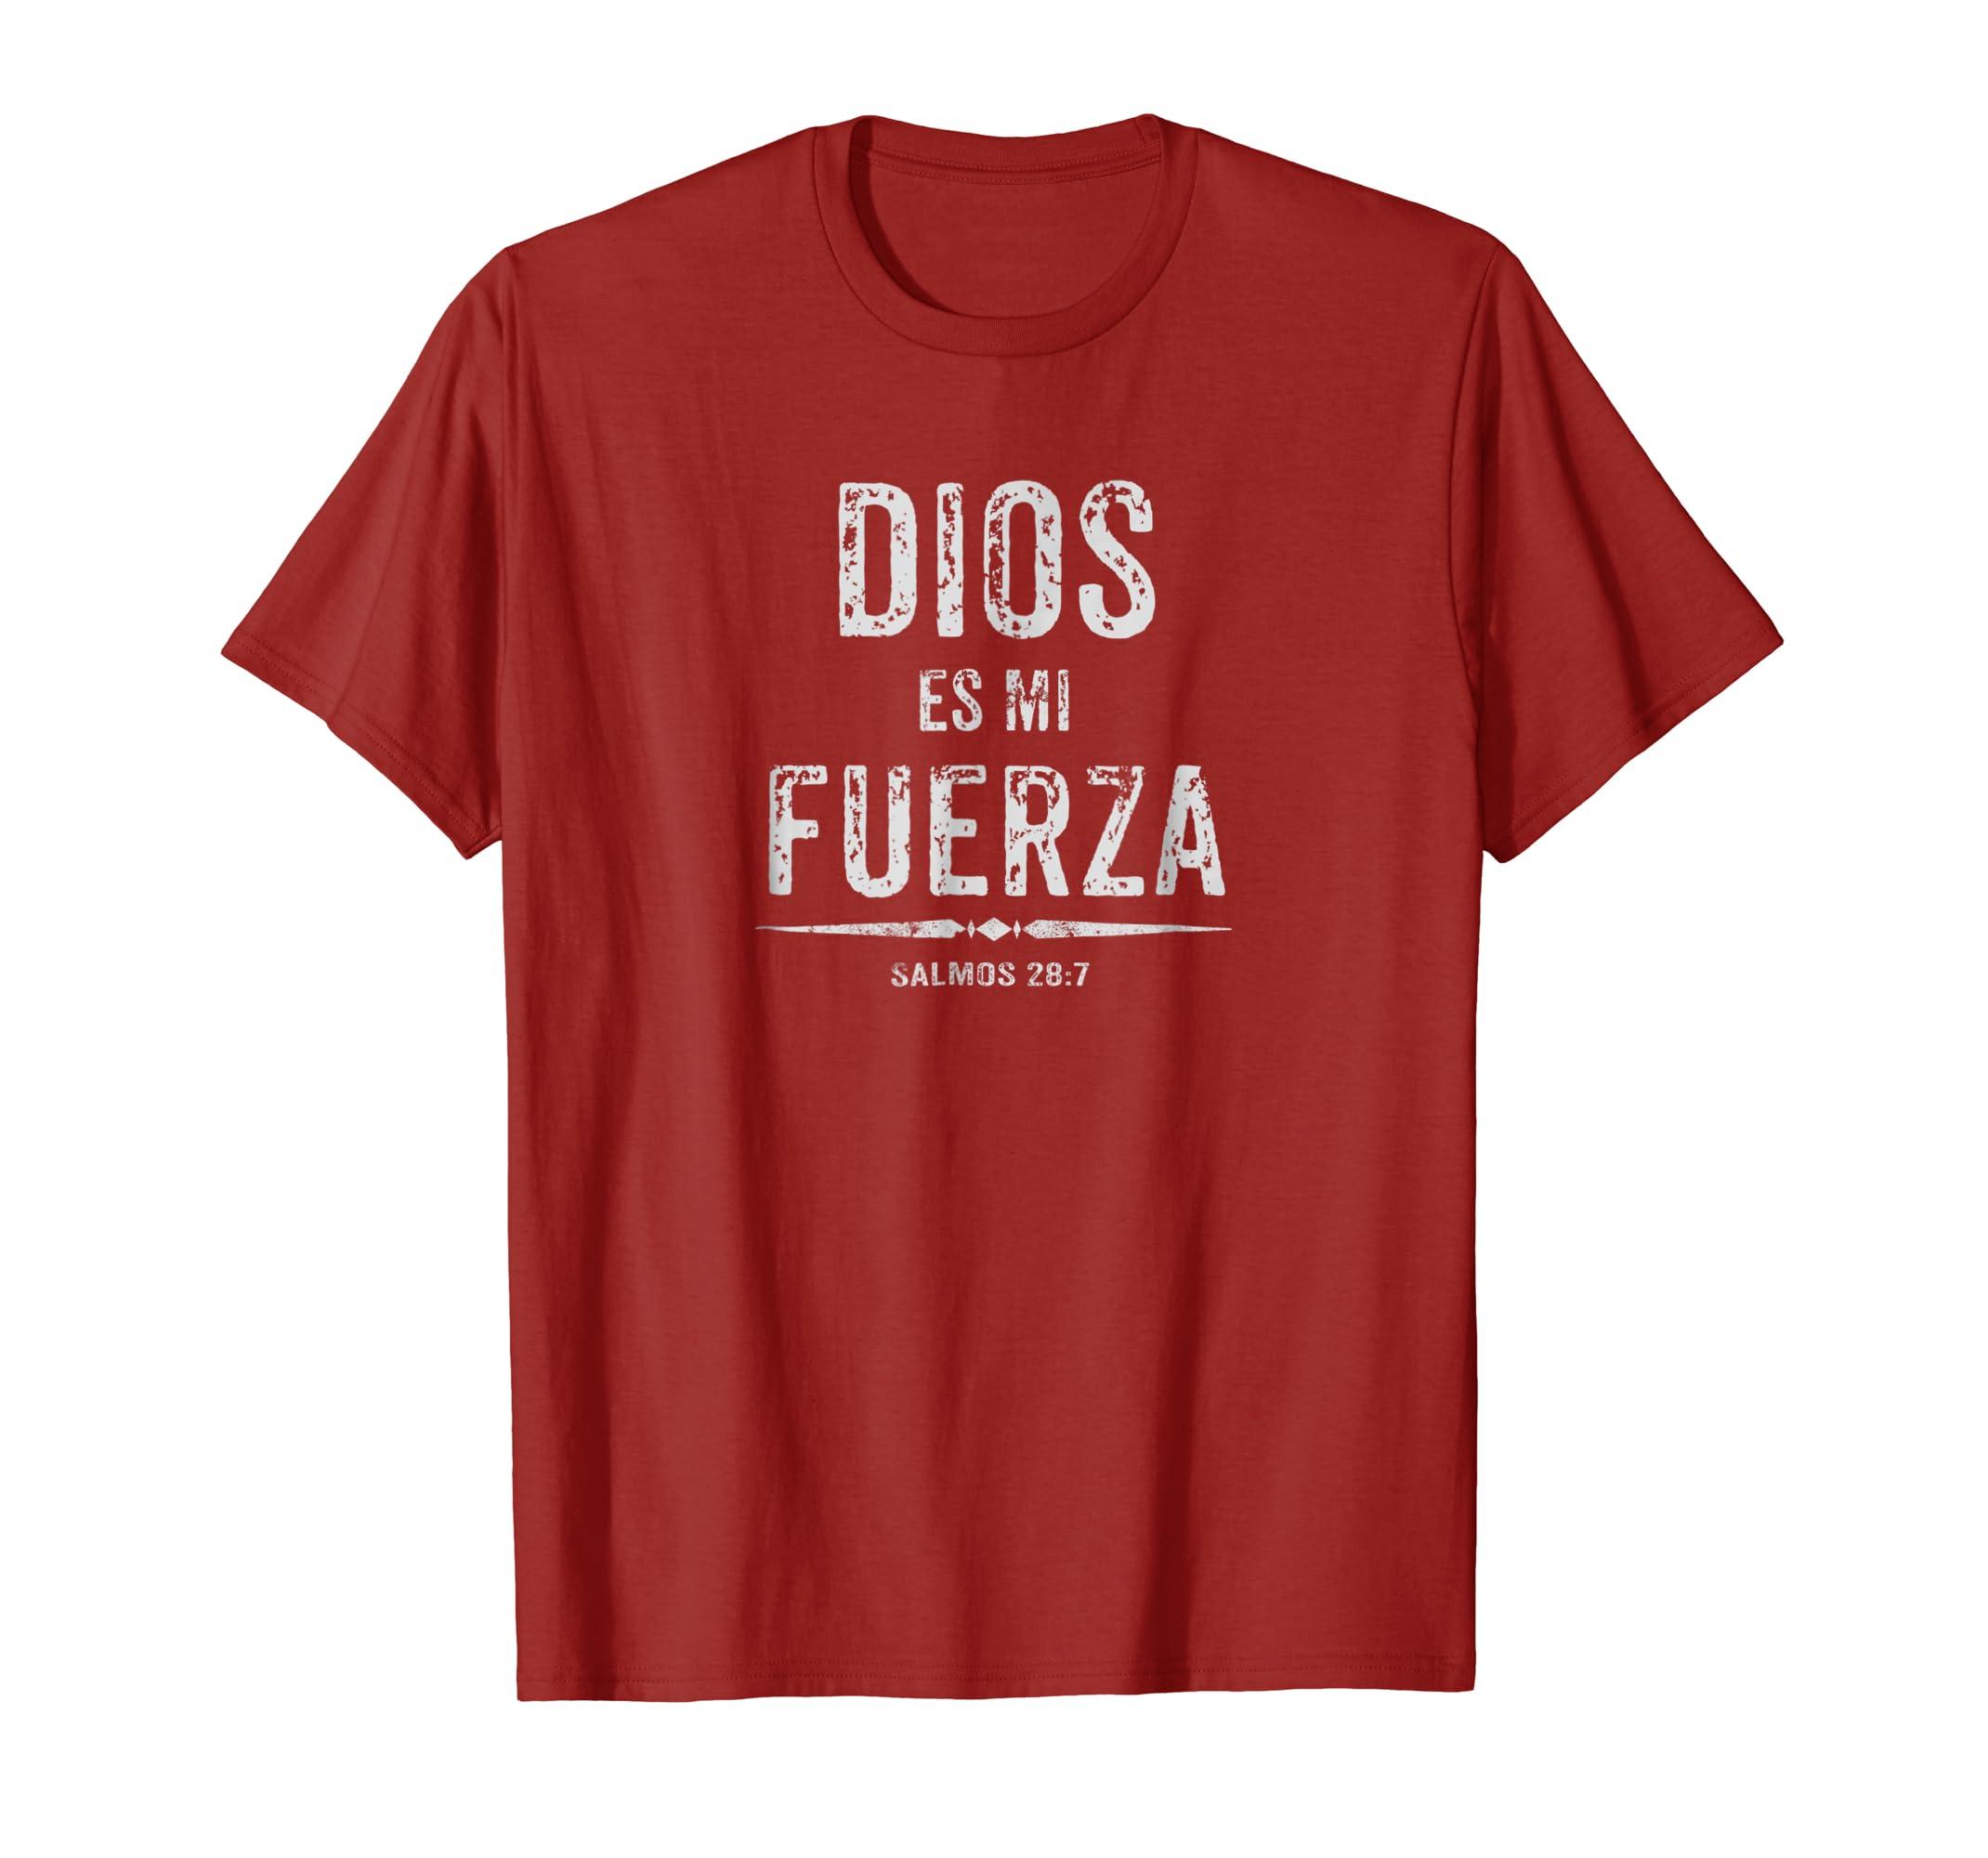 Amazoncom Christian Tee Shirts In Spanish Camisas En Espanol